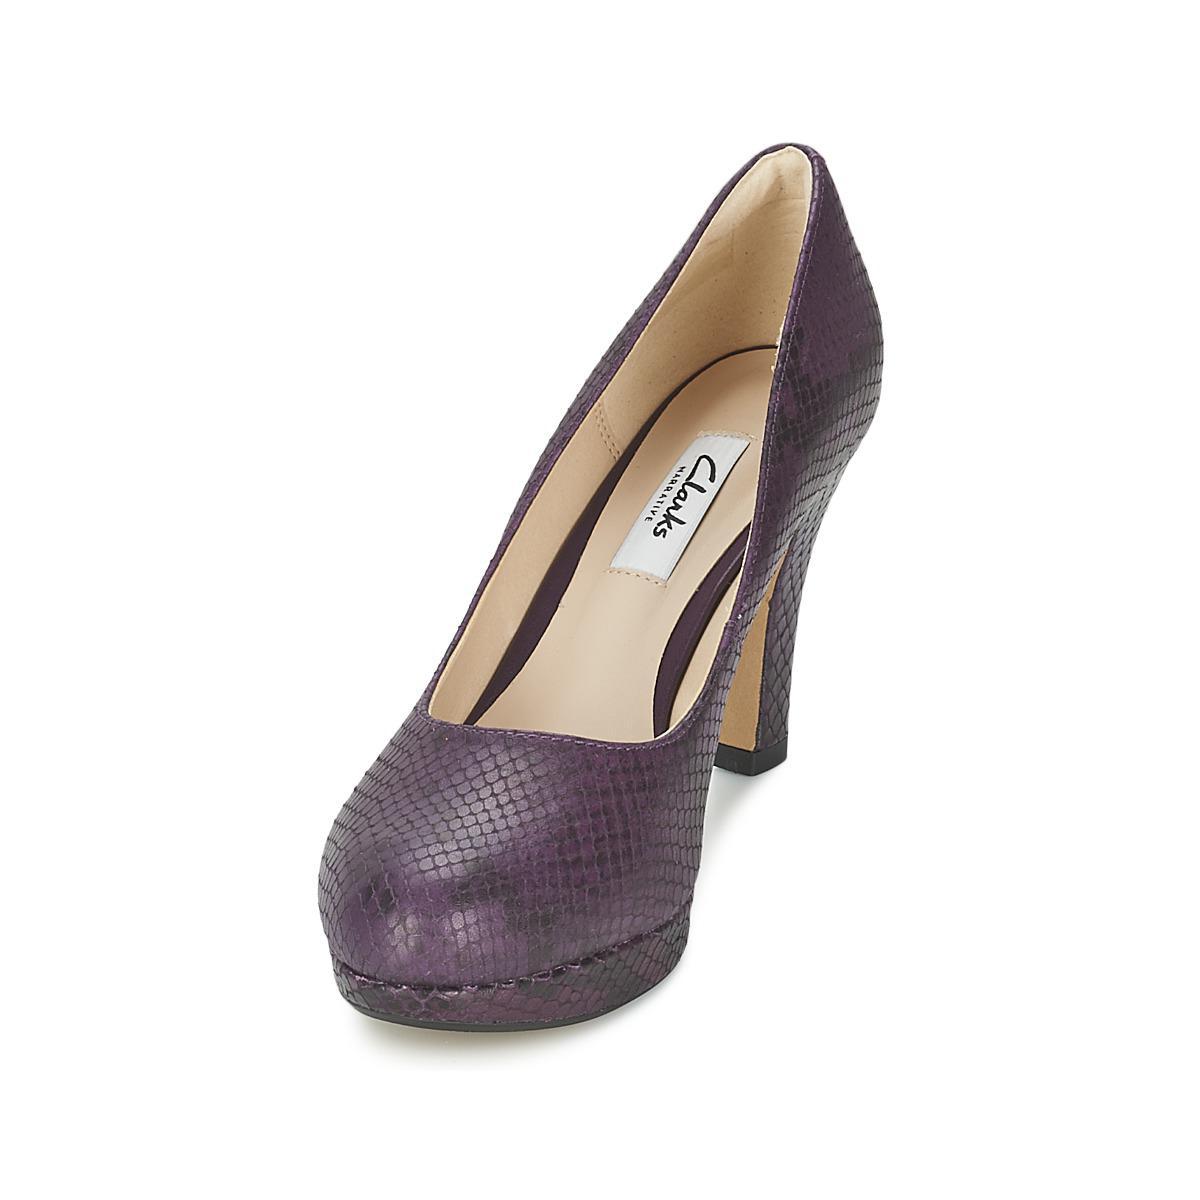 38e30c66fa8 Clarks - Crisp Kendra Women s Court Shoes In Purple - Lyst. View fullscreen